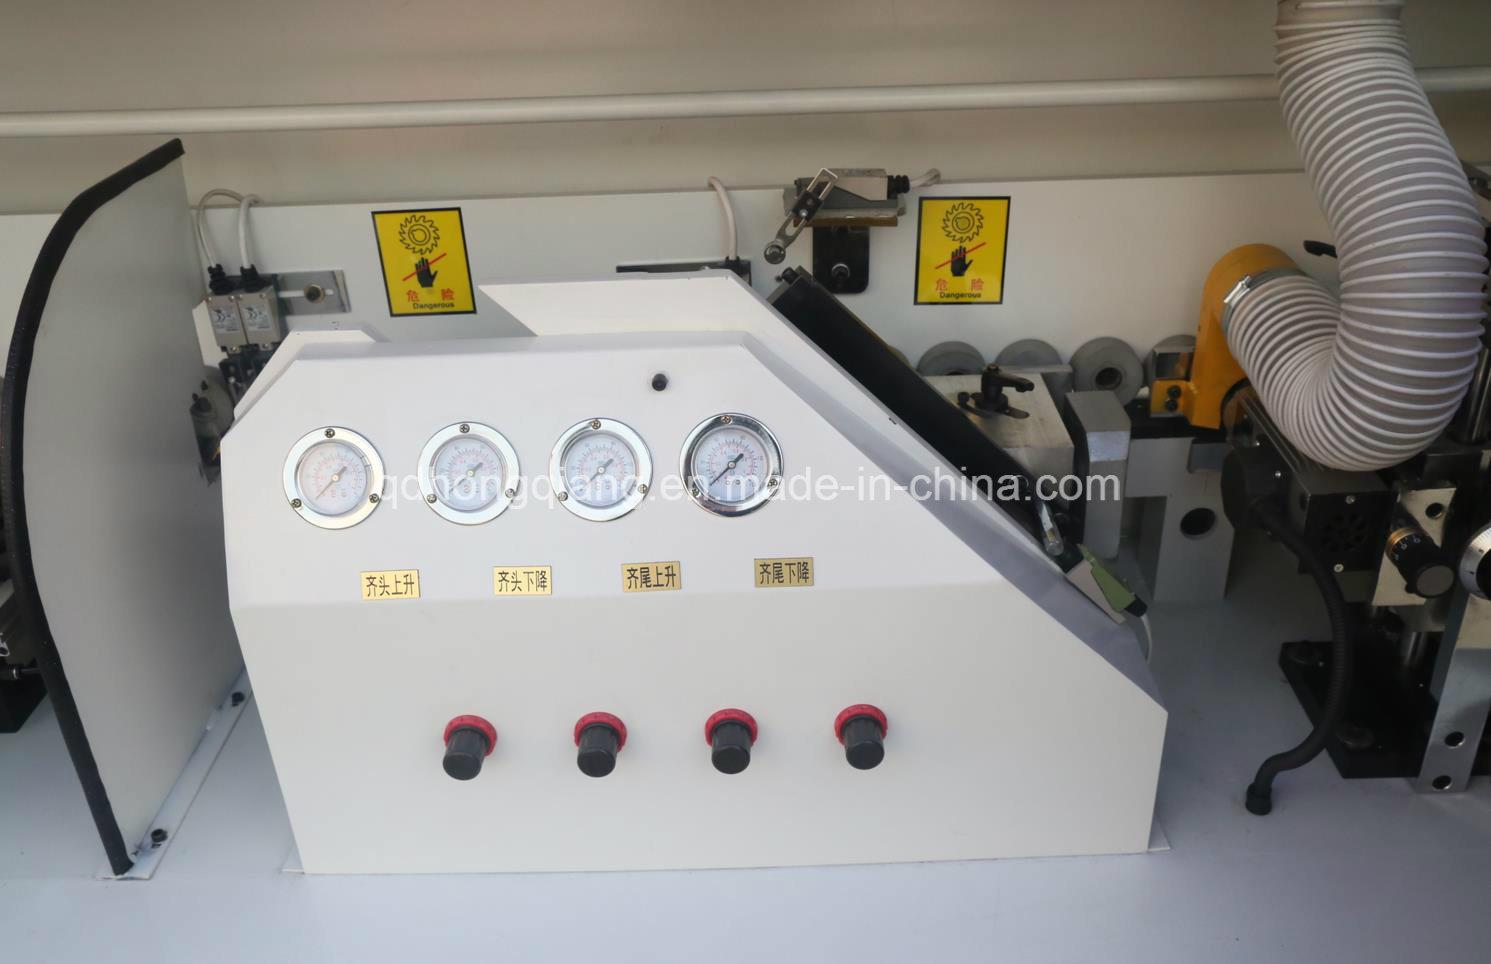 MDF Automatic Edge Banding machine /Edge Bander for Woodworking Machine 222389